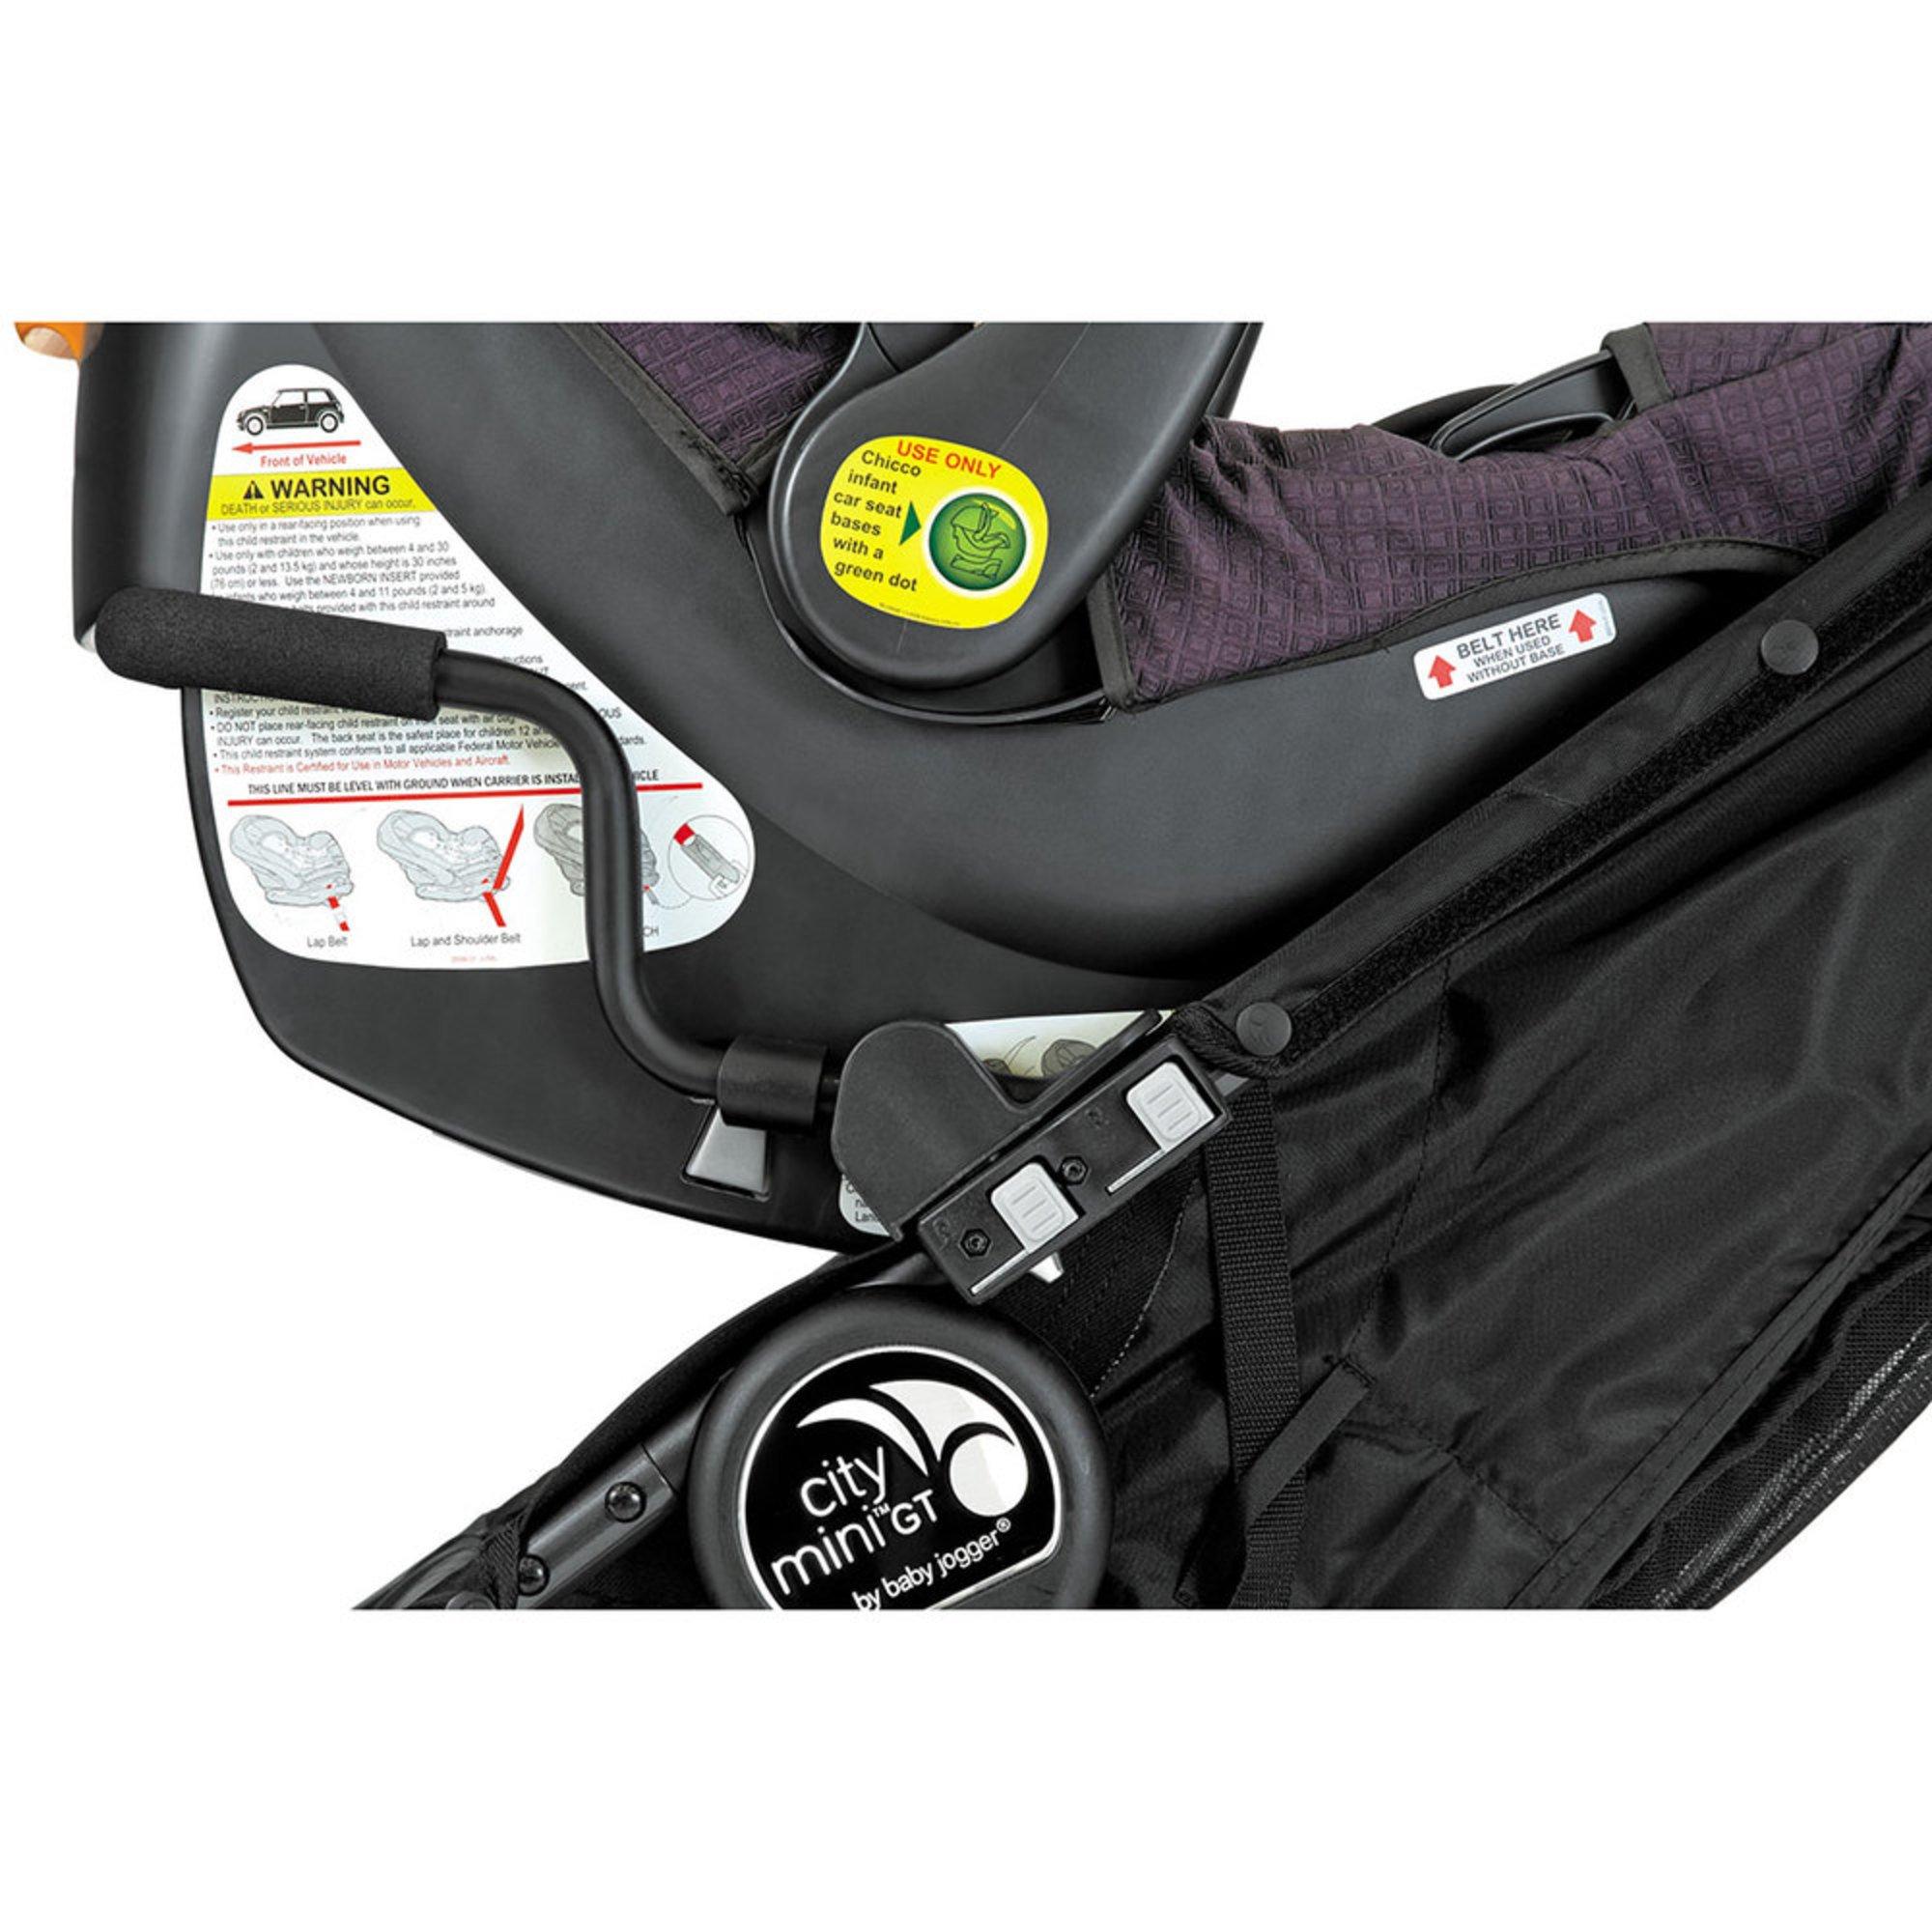 Baby Jogger Car Seat Adapter Single (city Mini) | Stroller ...